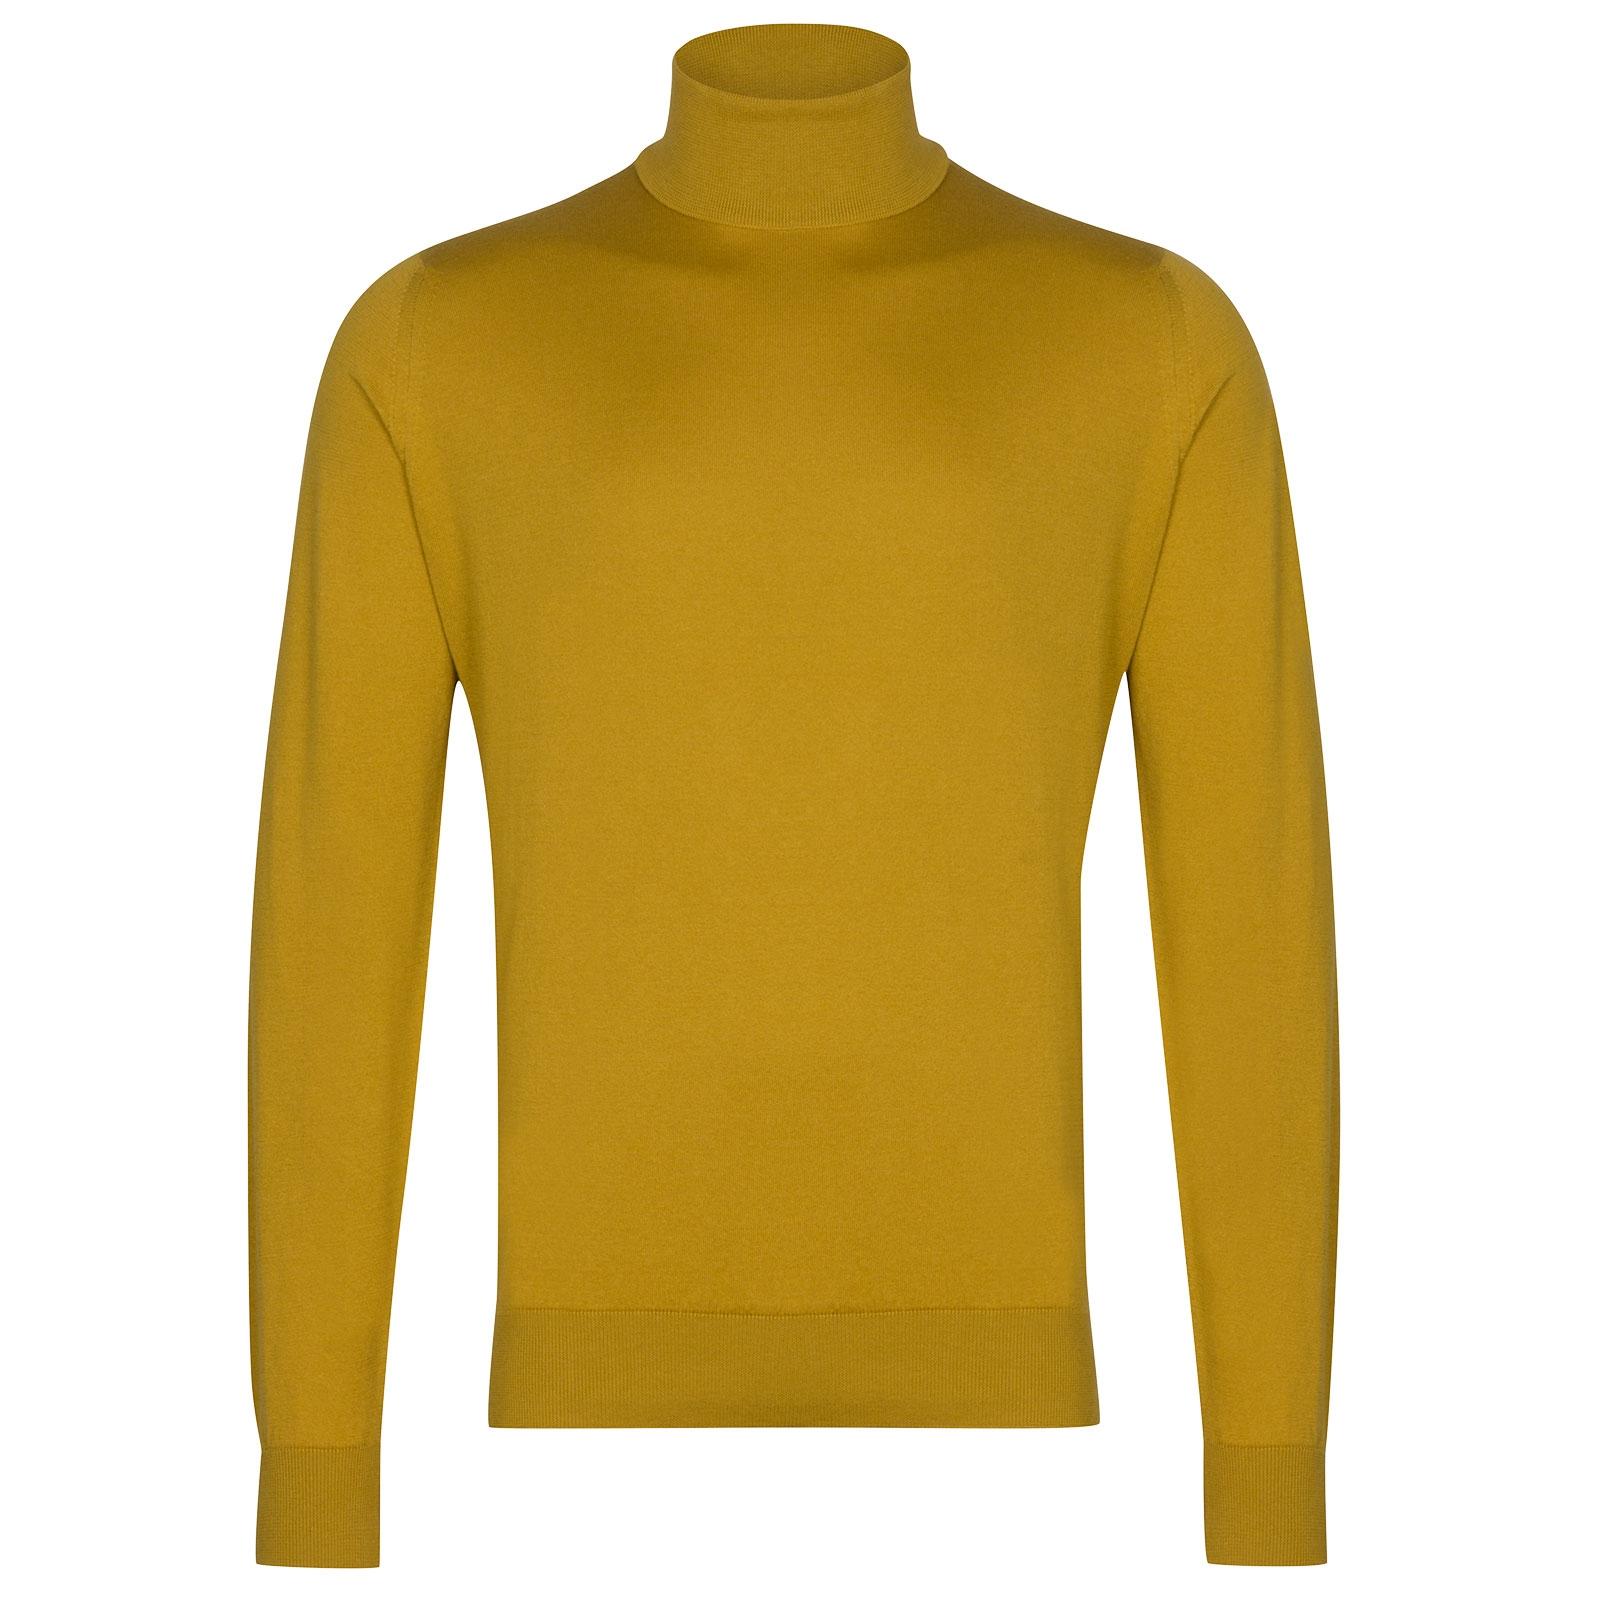 John Smedley Hawley in Stamen Yellow Pullover-MED